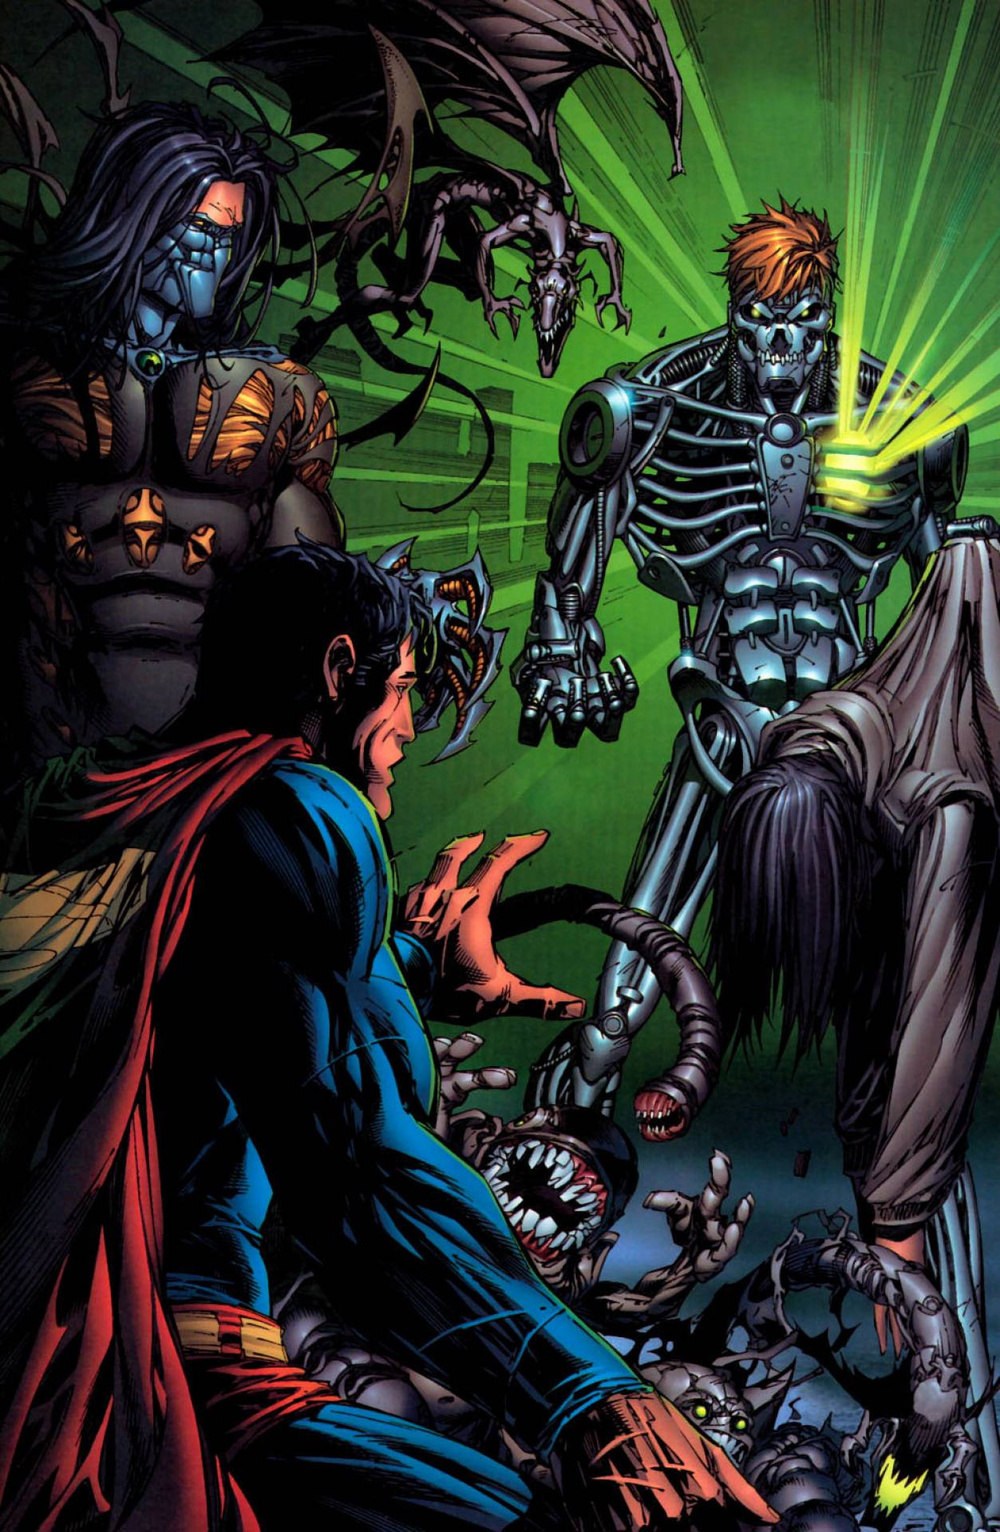 will-batman-vs-superman-villain-be-metallo.jpg